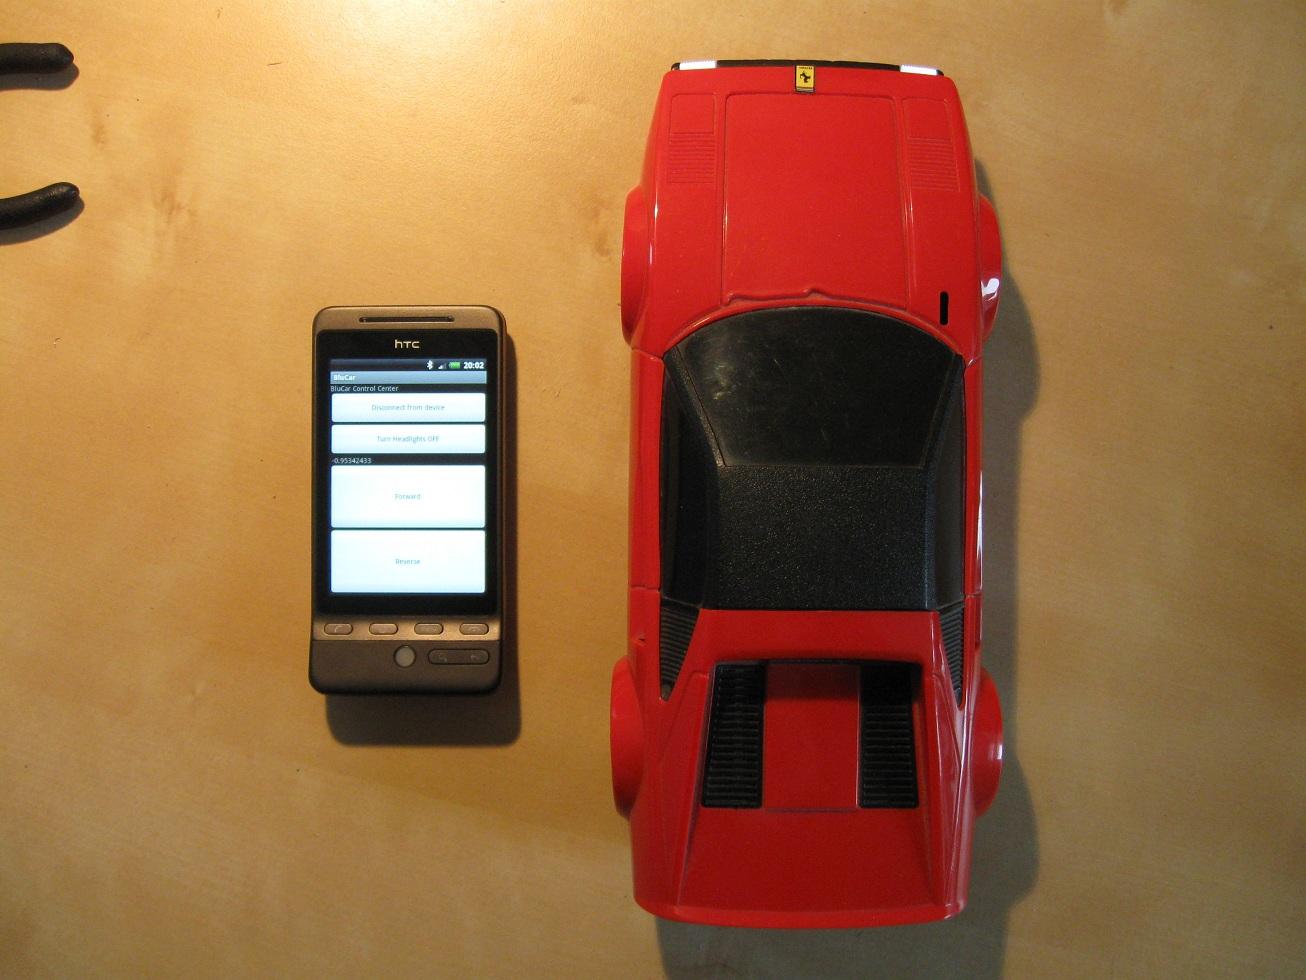 http://uzzors2k.4hv.org/projectfiles/blucar/hero_and_car.JPG